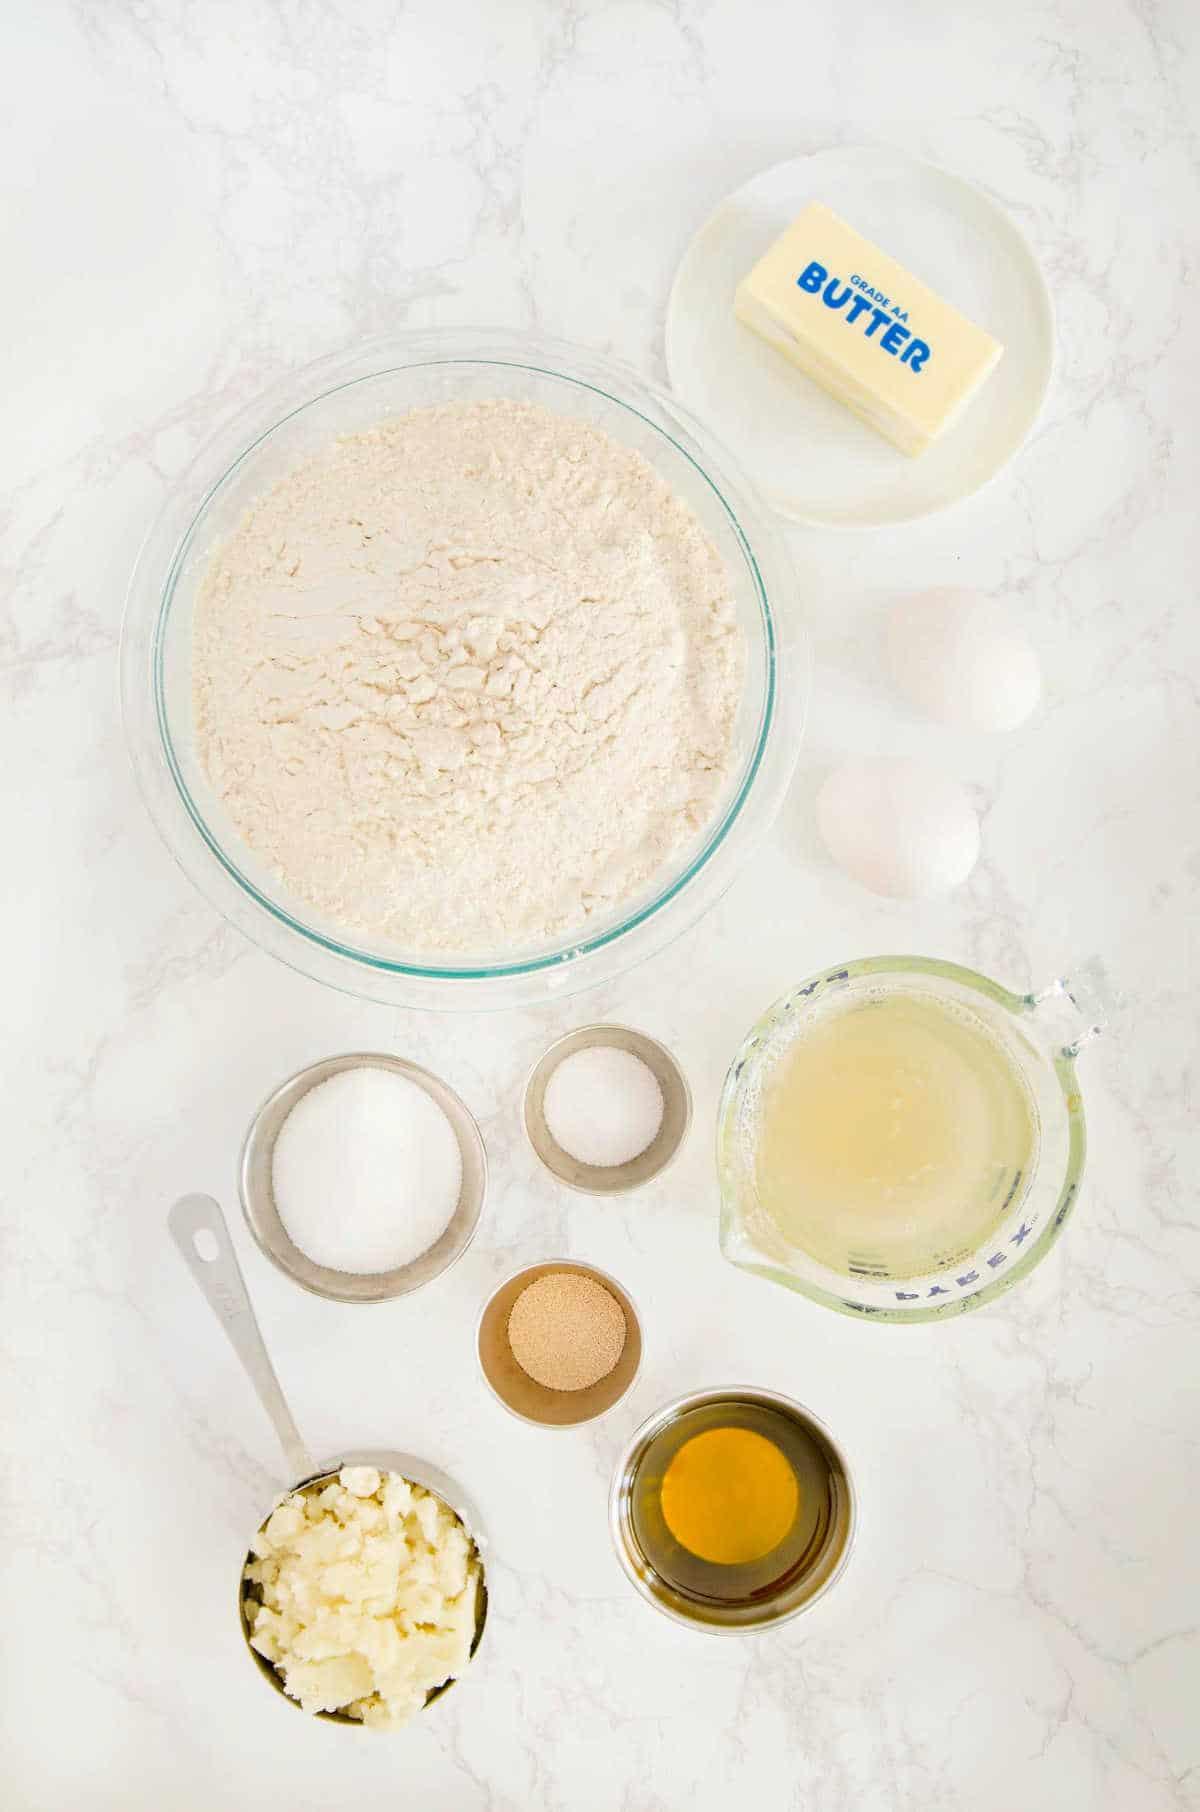 Overhead shot of bowls of ingredients for sandwich bread including flour,, butter, salt, mashed potato, potato water, etc.